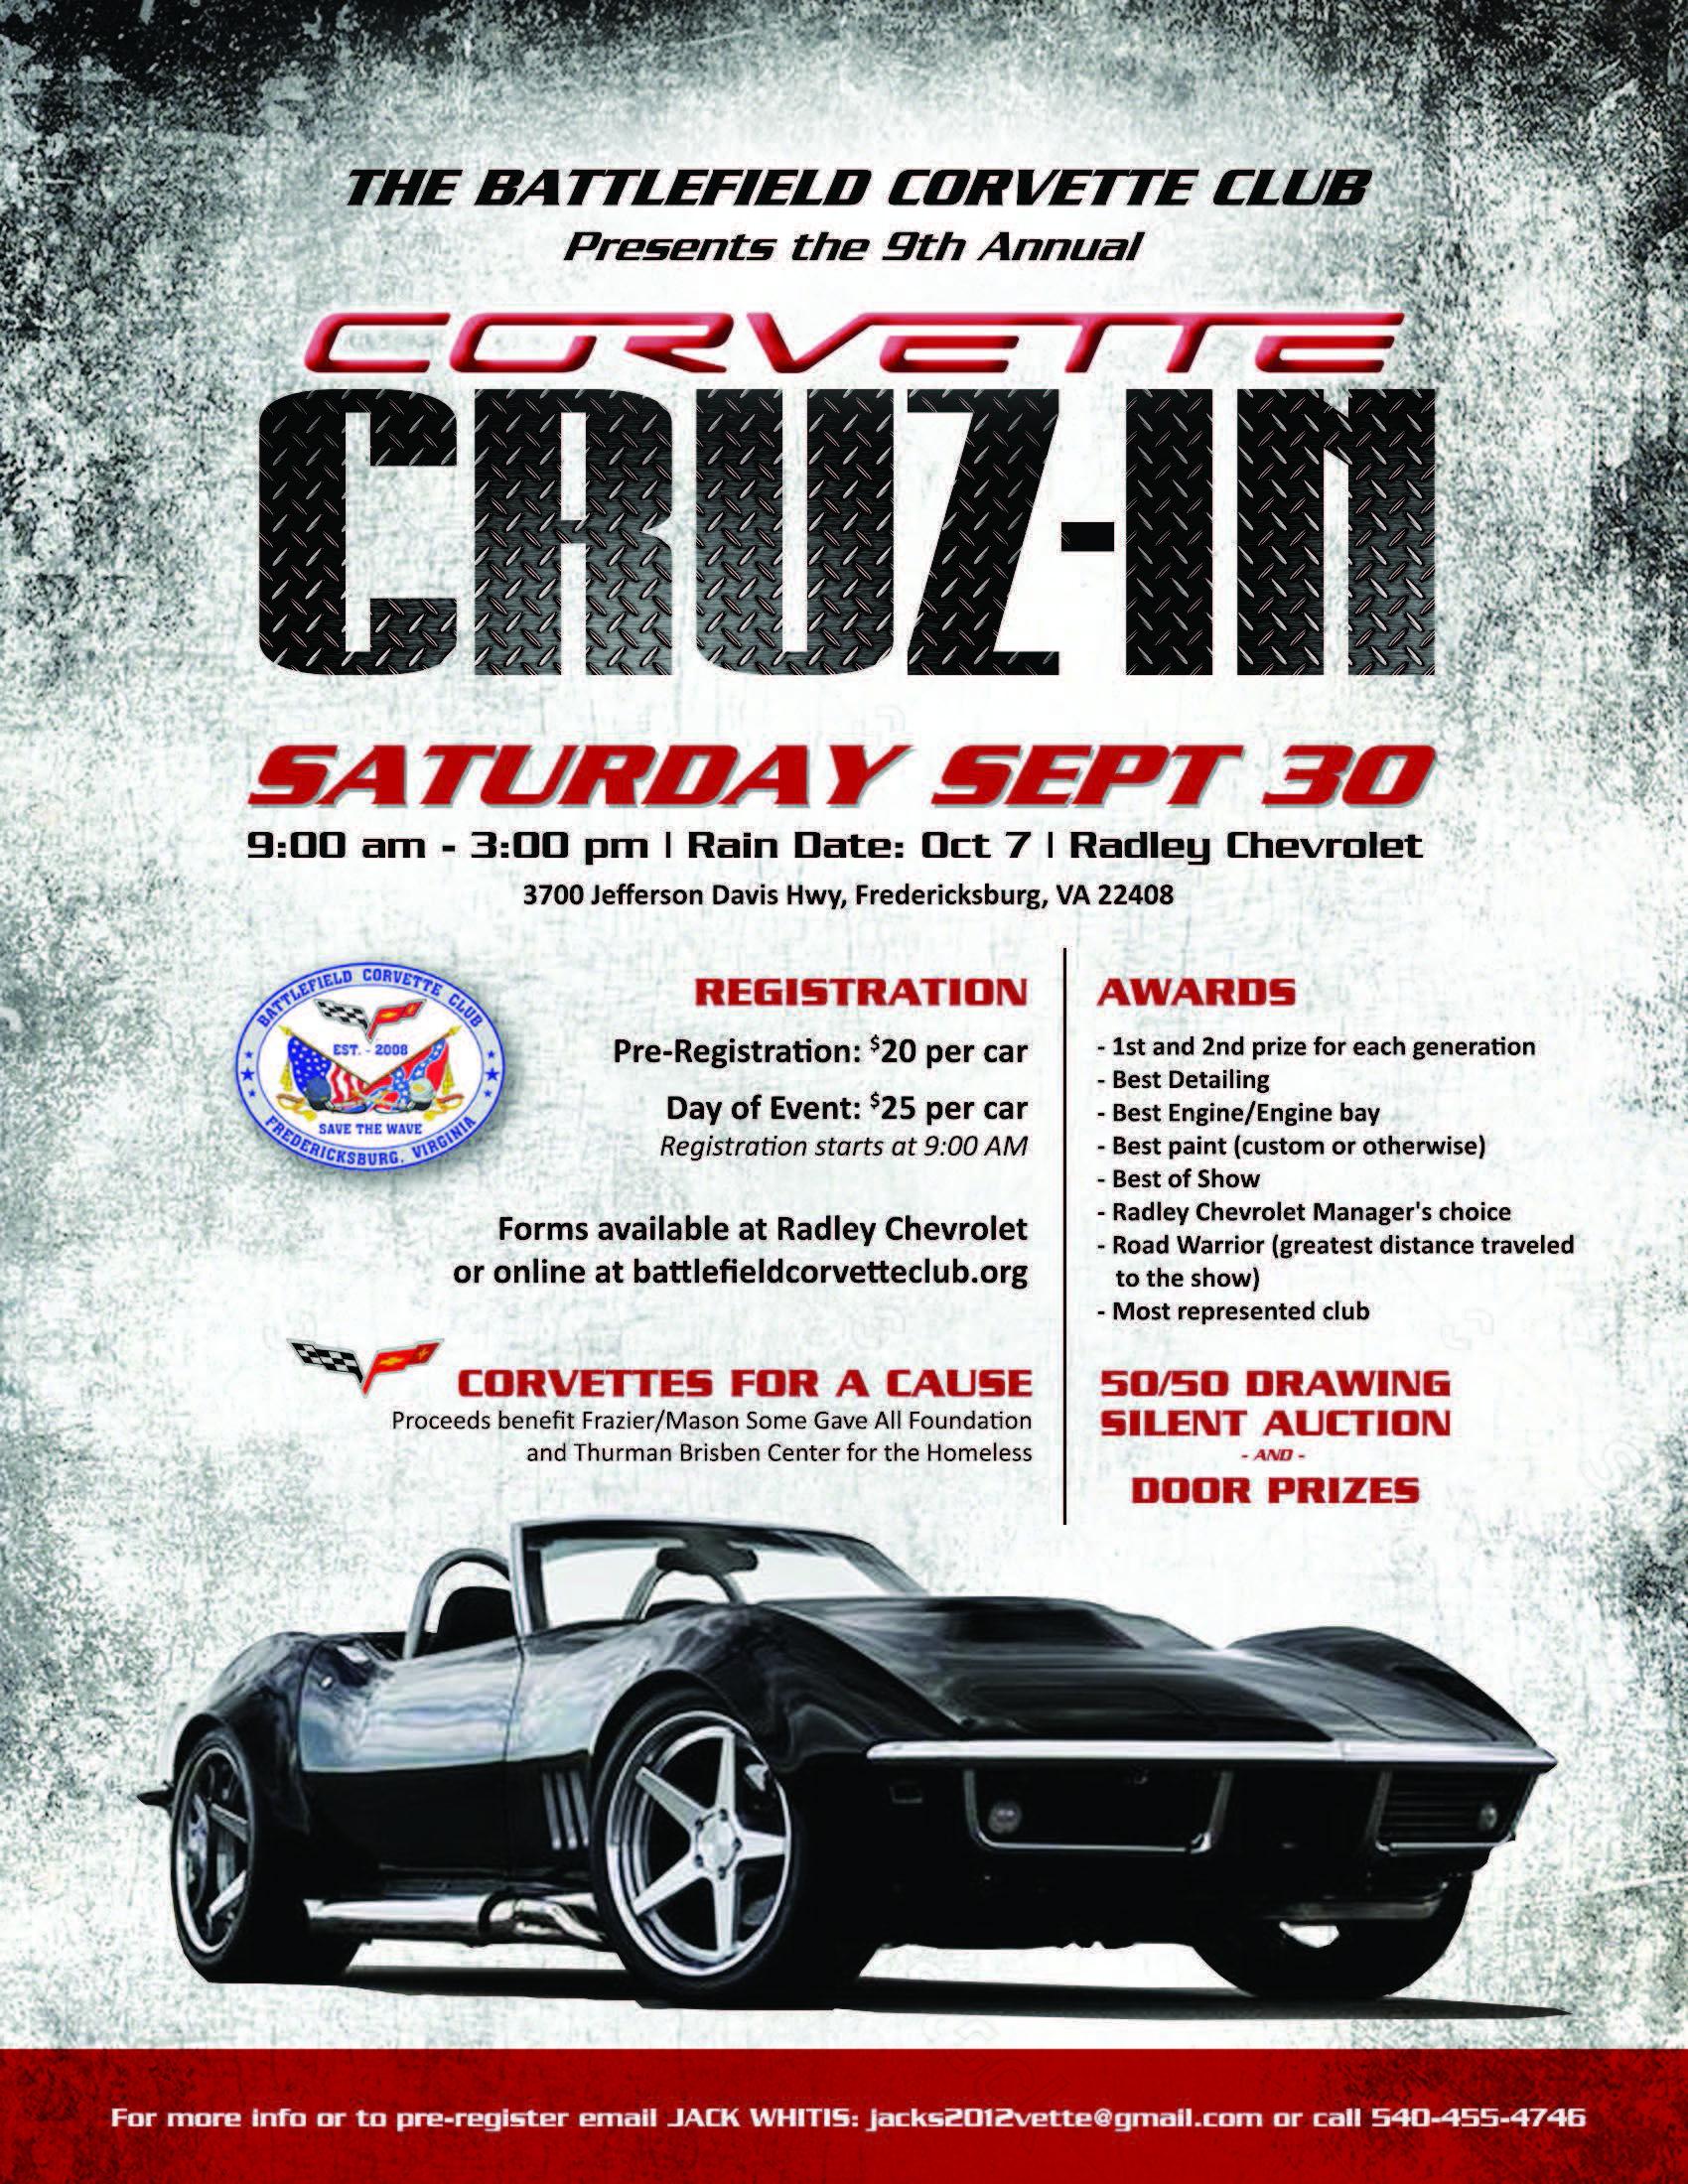 battlefield corvette club all corvette charity car show. Black Bedroom Furniture Sets. Home Design Ideas